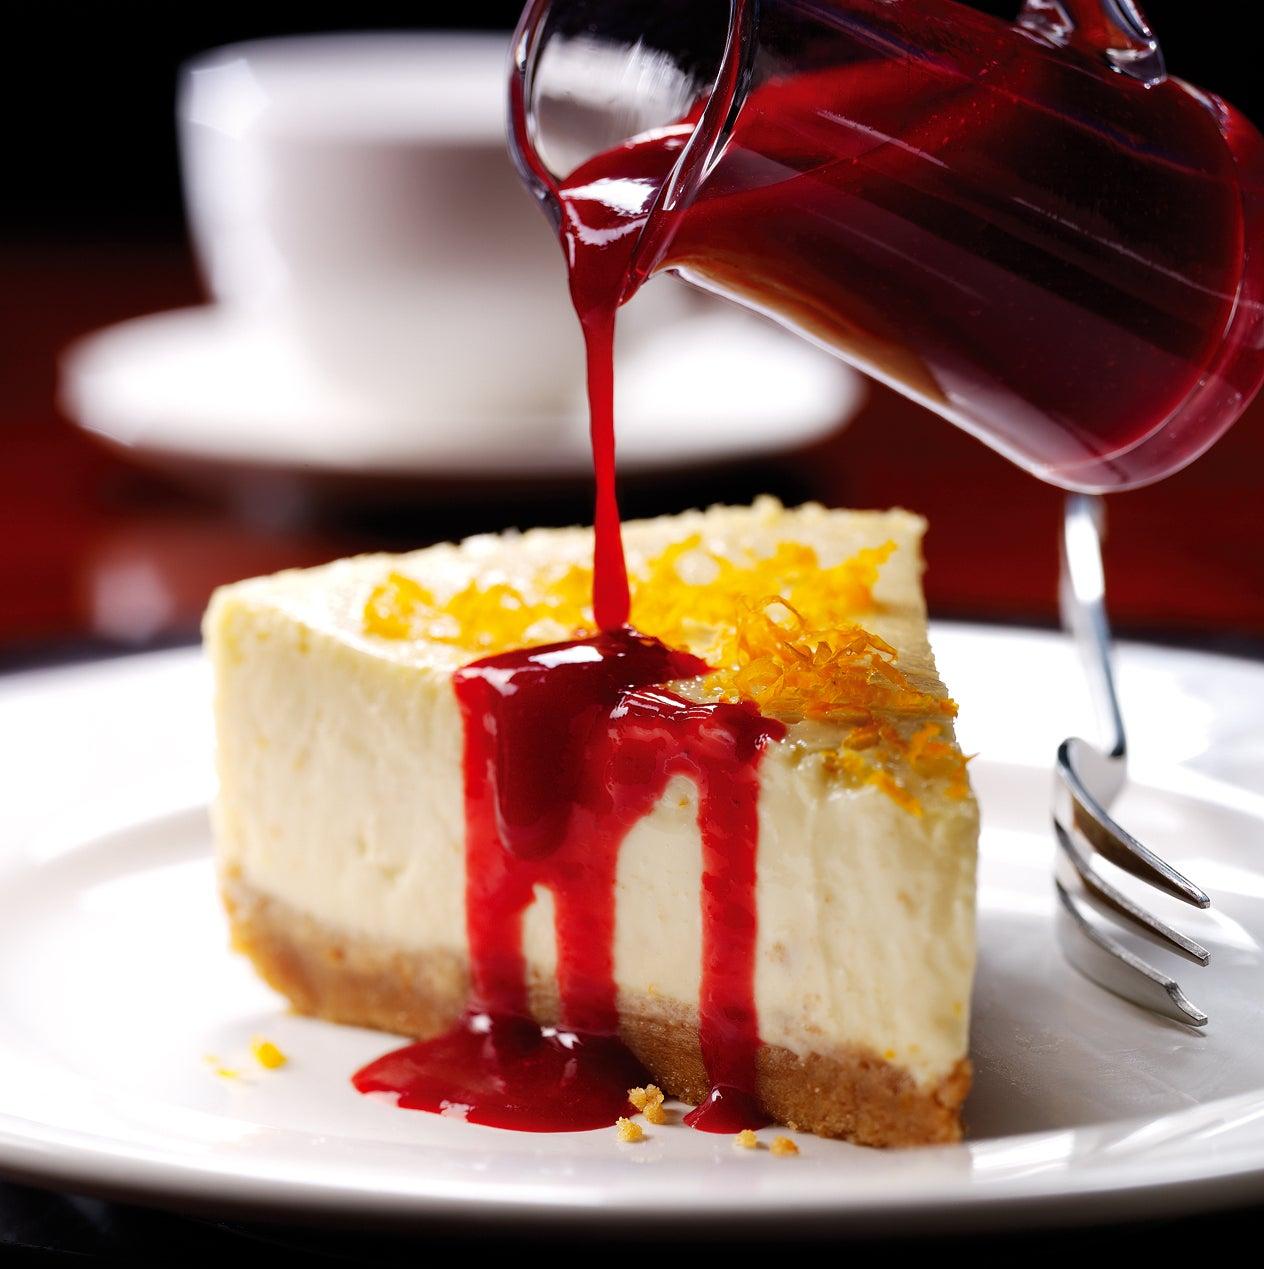 1-Baked-Cheesecake.jpg